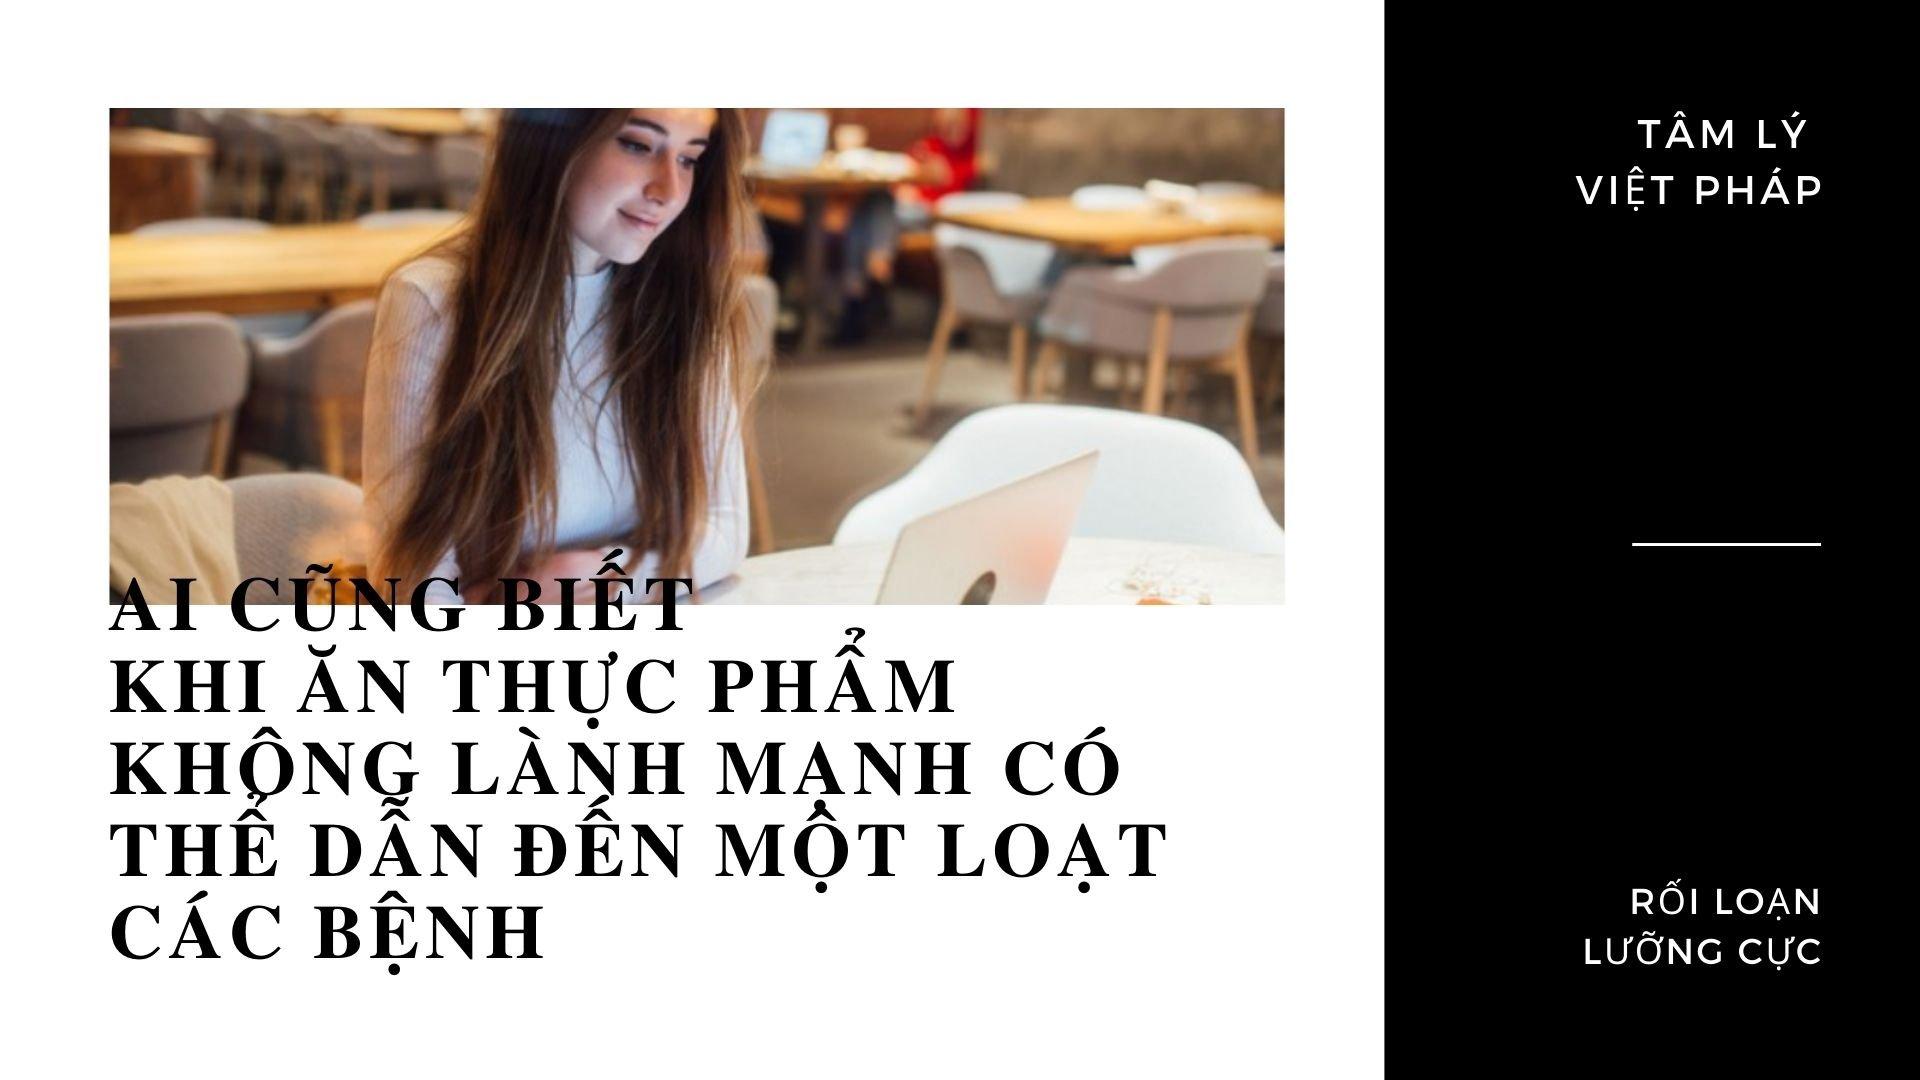 su dung thuc pham khong lanh manh co the mac benh